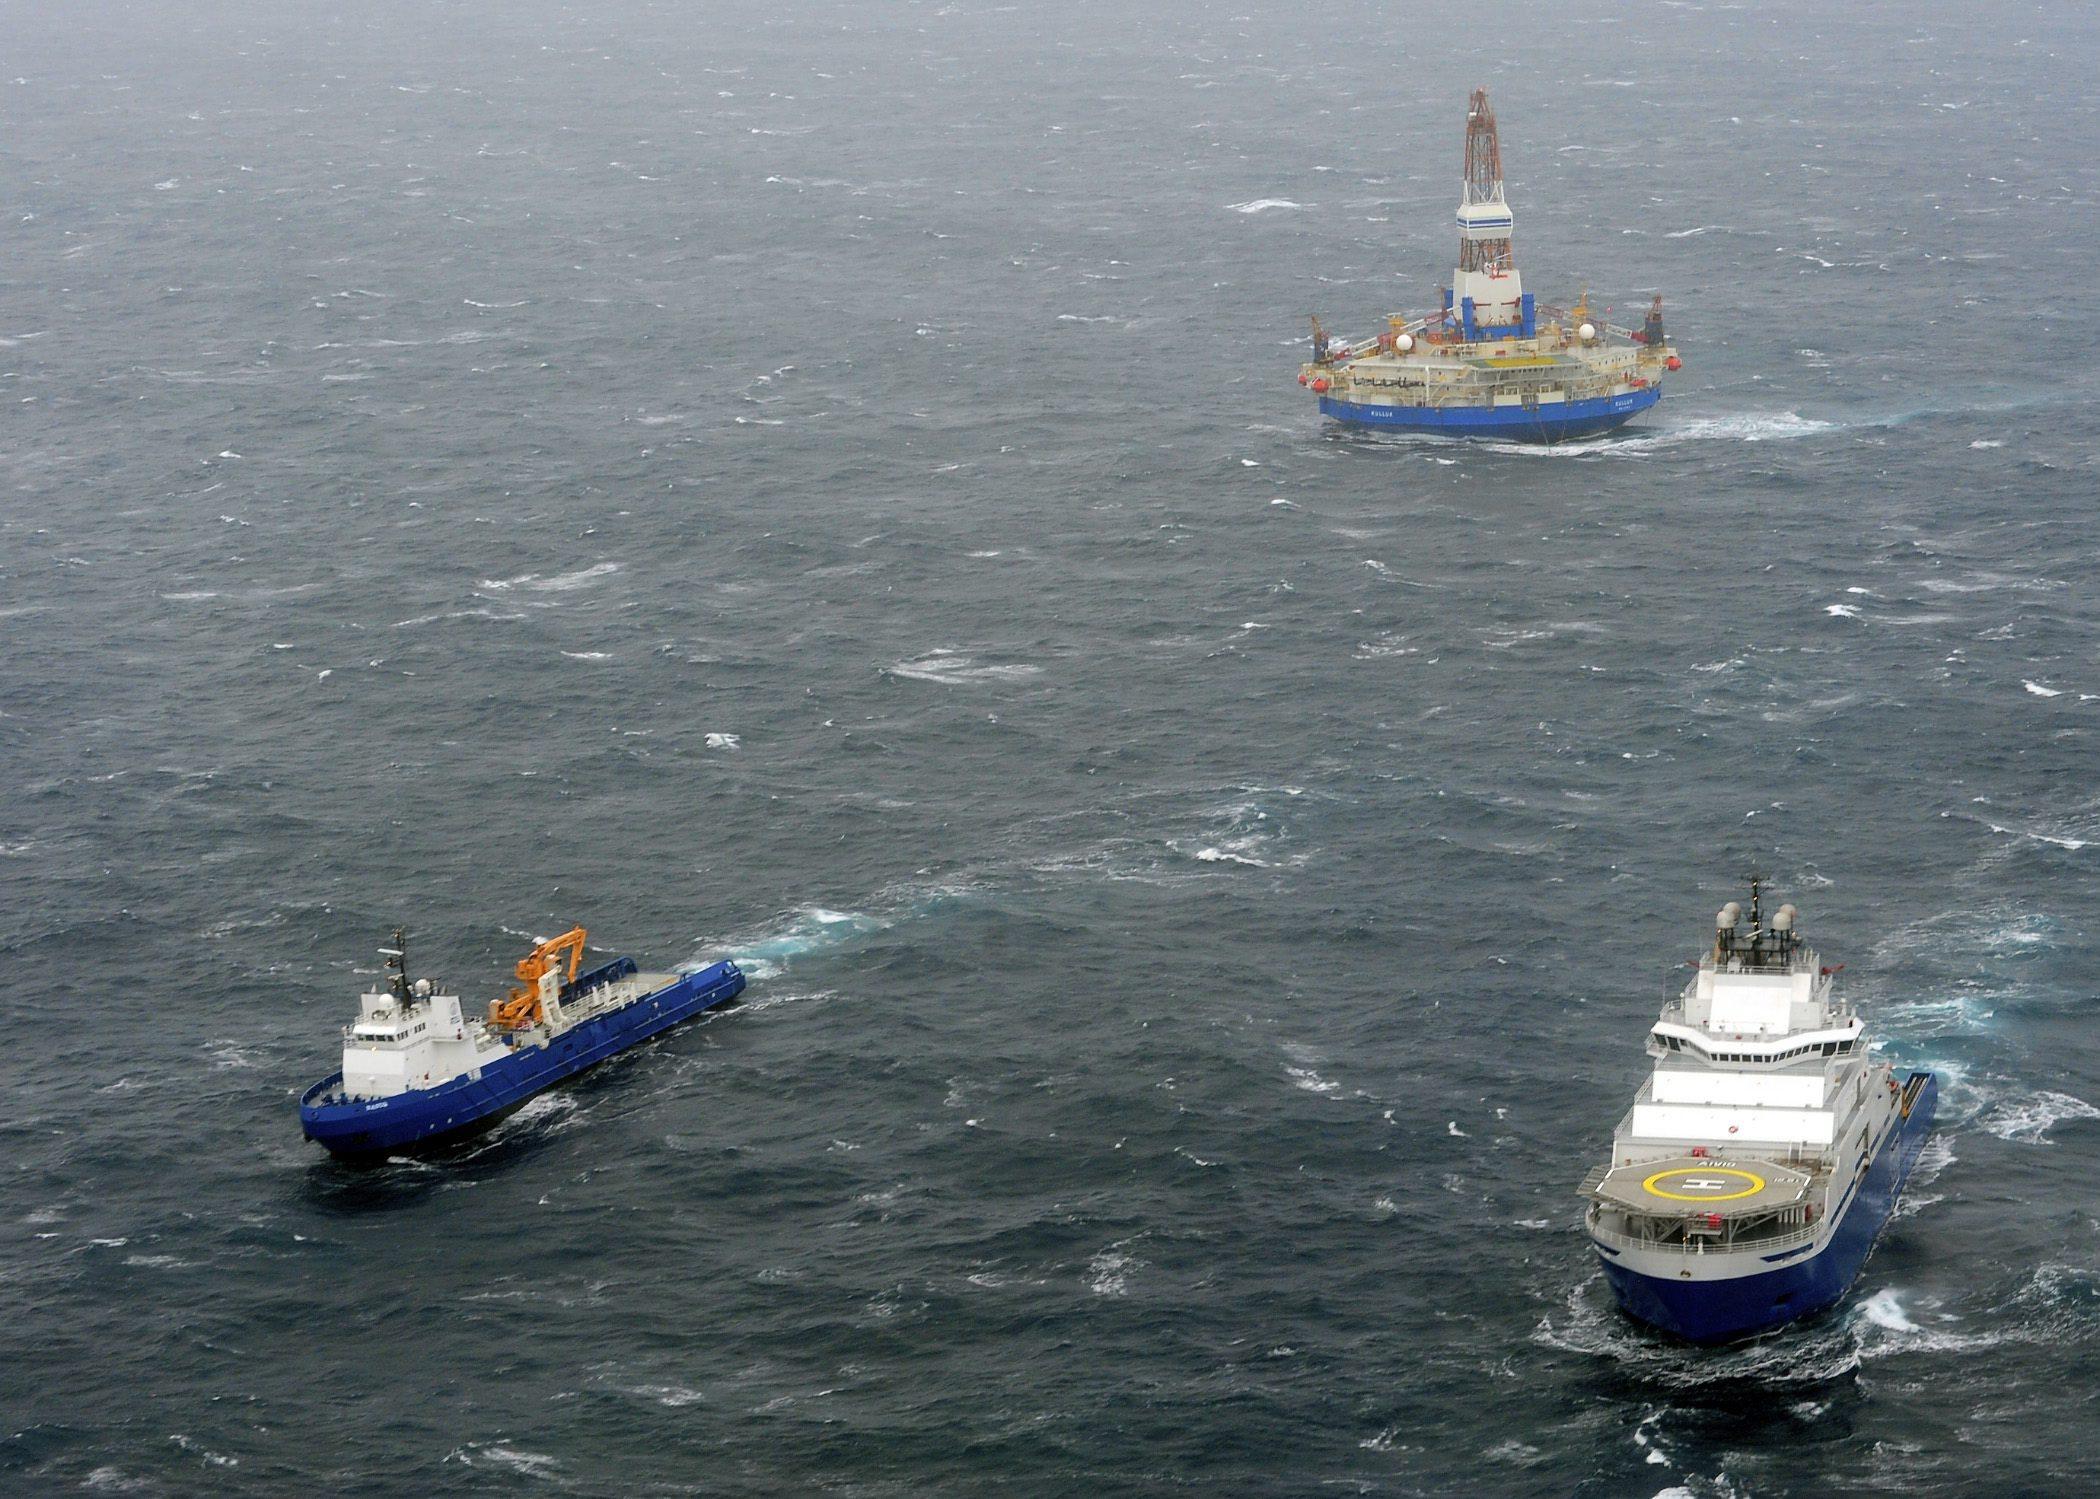 The tugs Aiviq and Nanuq tow the mobile drilling unit Kulluk  80 miles southwest of Kodiak City, Alaska on Dec. 29, 2012. (Petty Officer 1st Class Sara Francis / United States Coast Guard / AP)